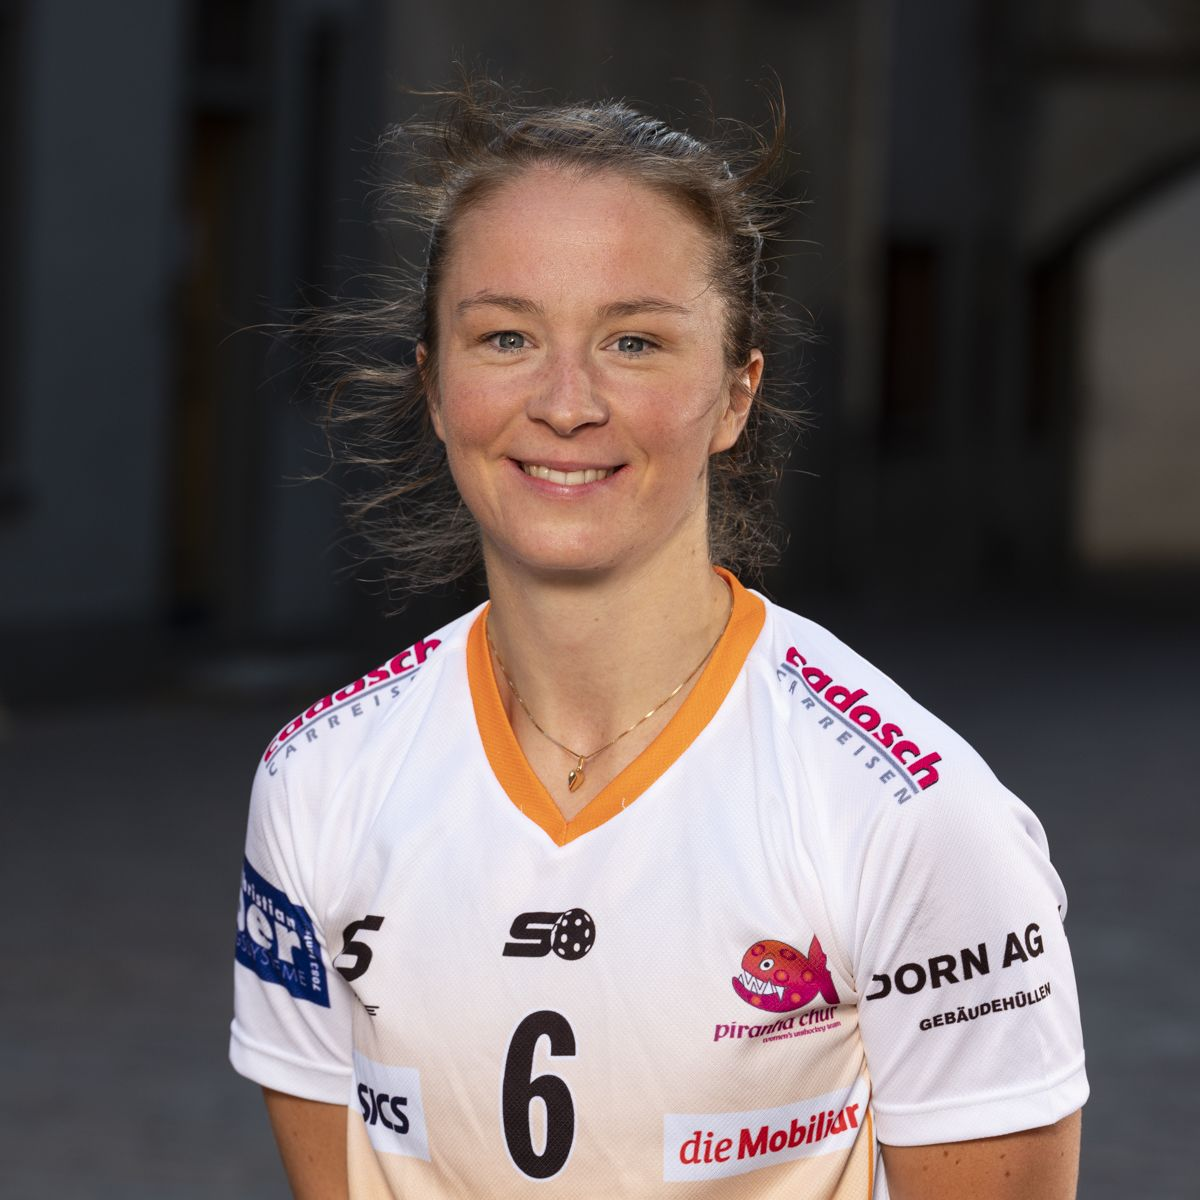 Karen Farnes #6_NLA_piranha Chur_Saison 2019-2020_1200x1200_01.jpg